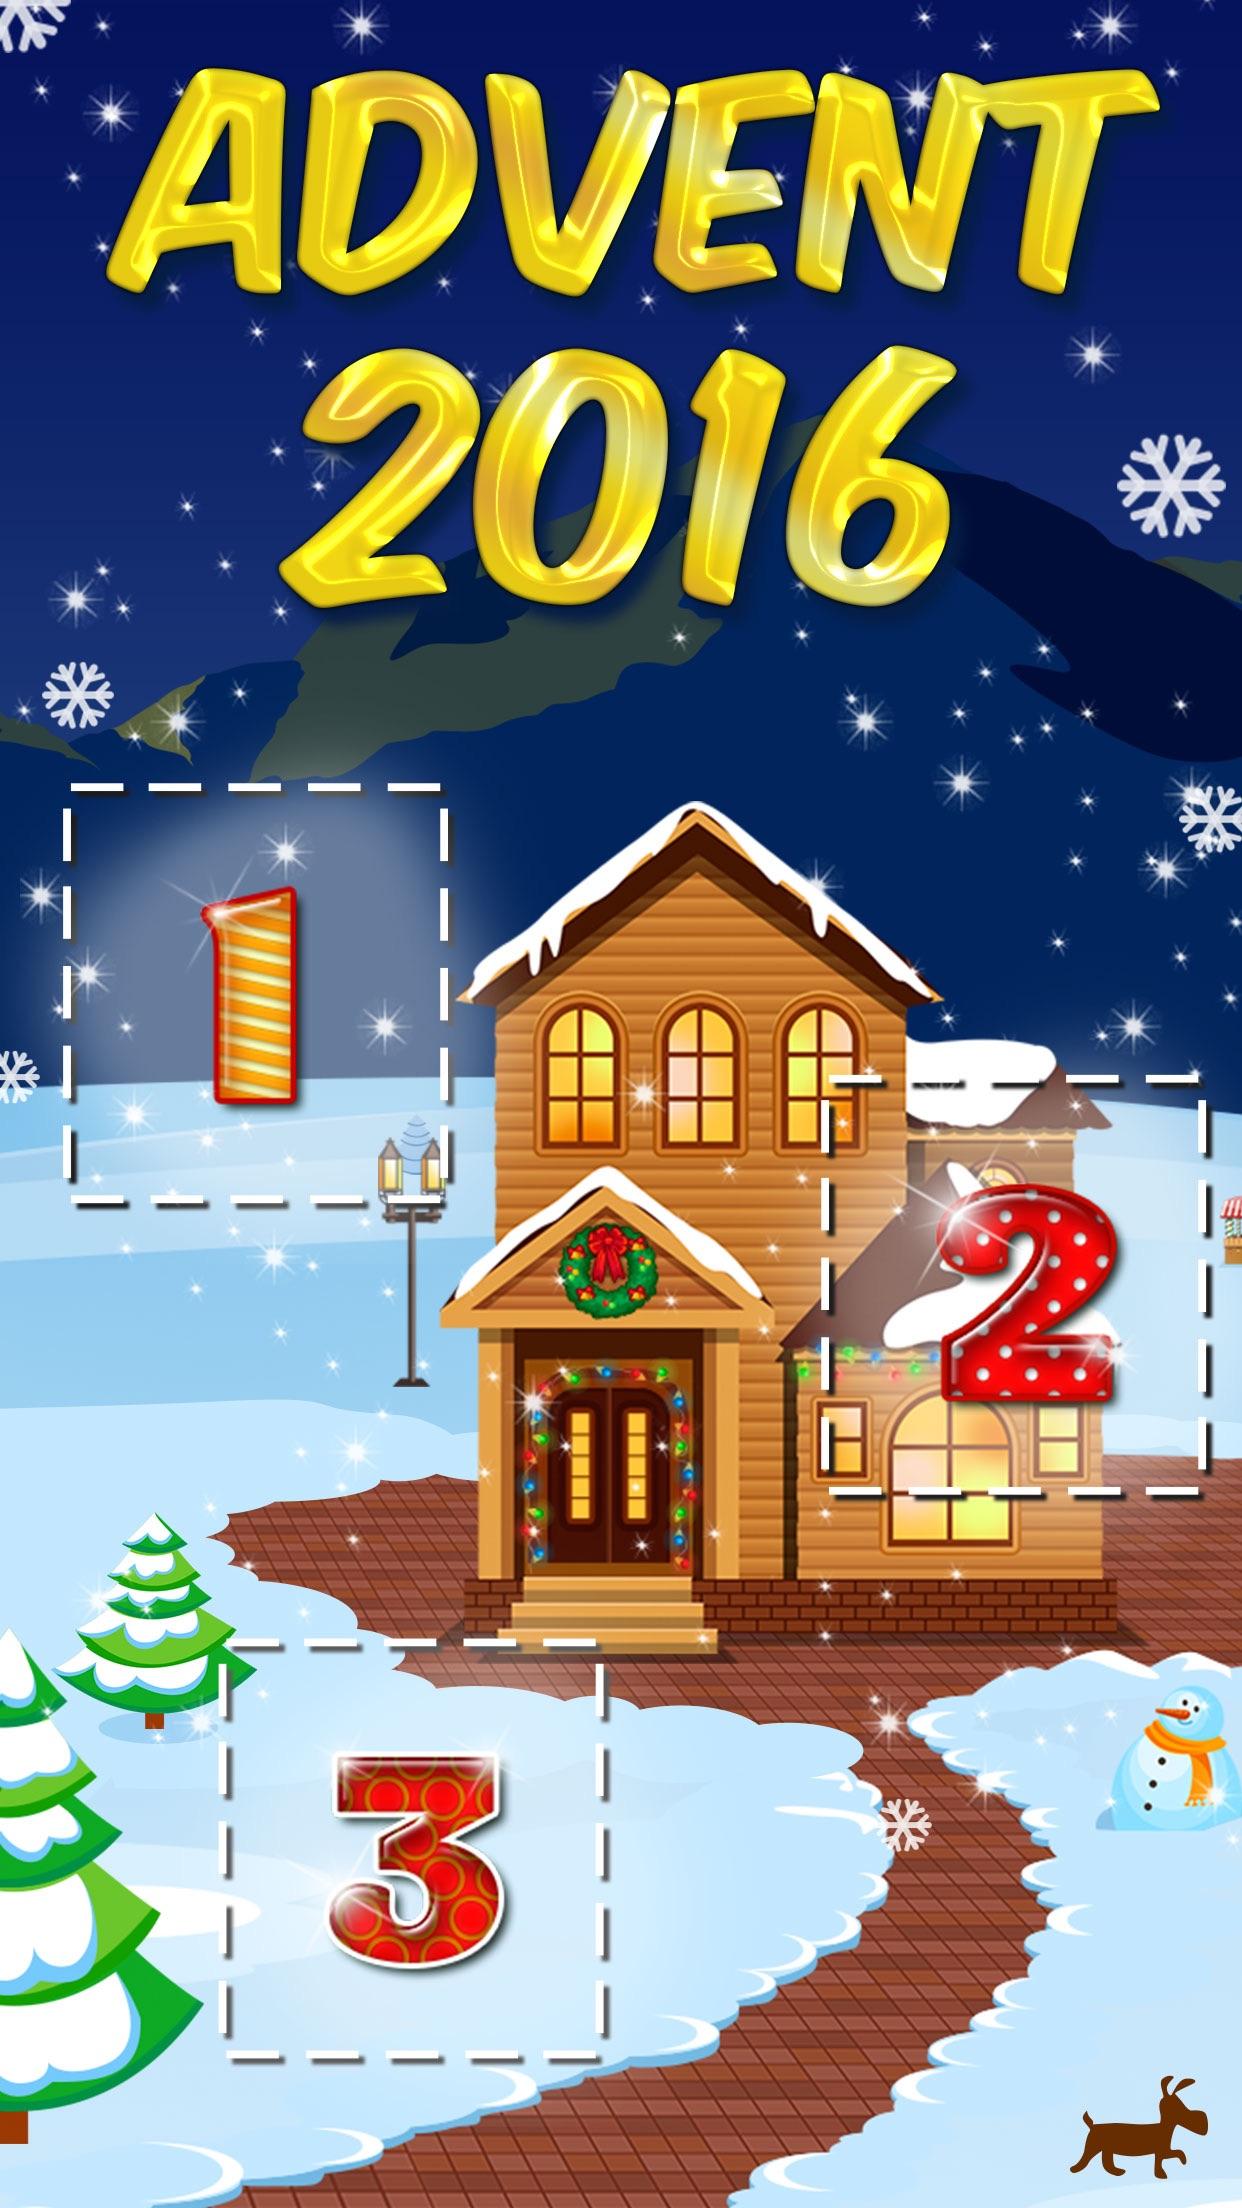 25 Days of Christmas 2016 Screenshot